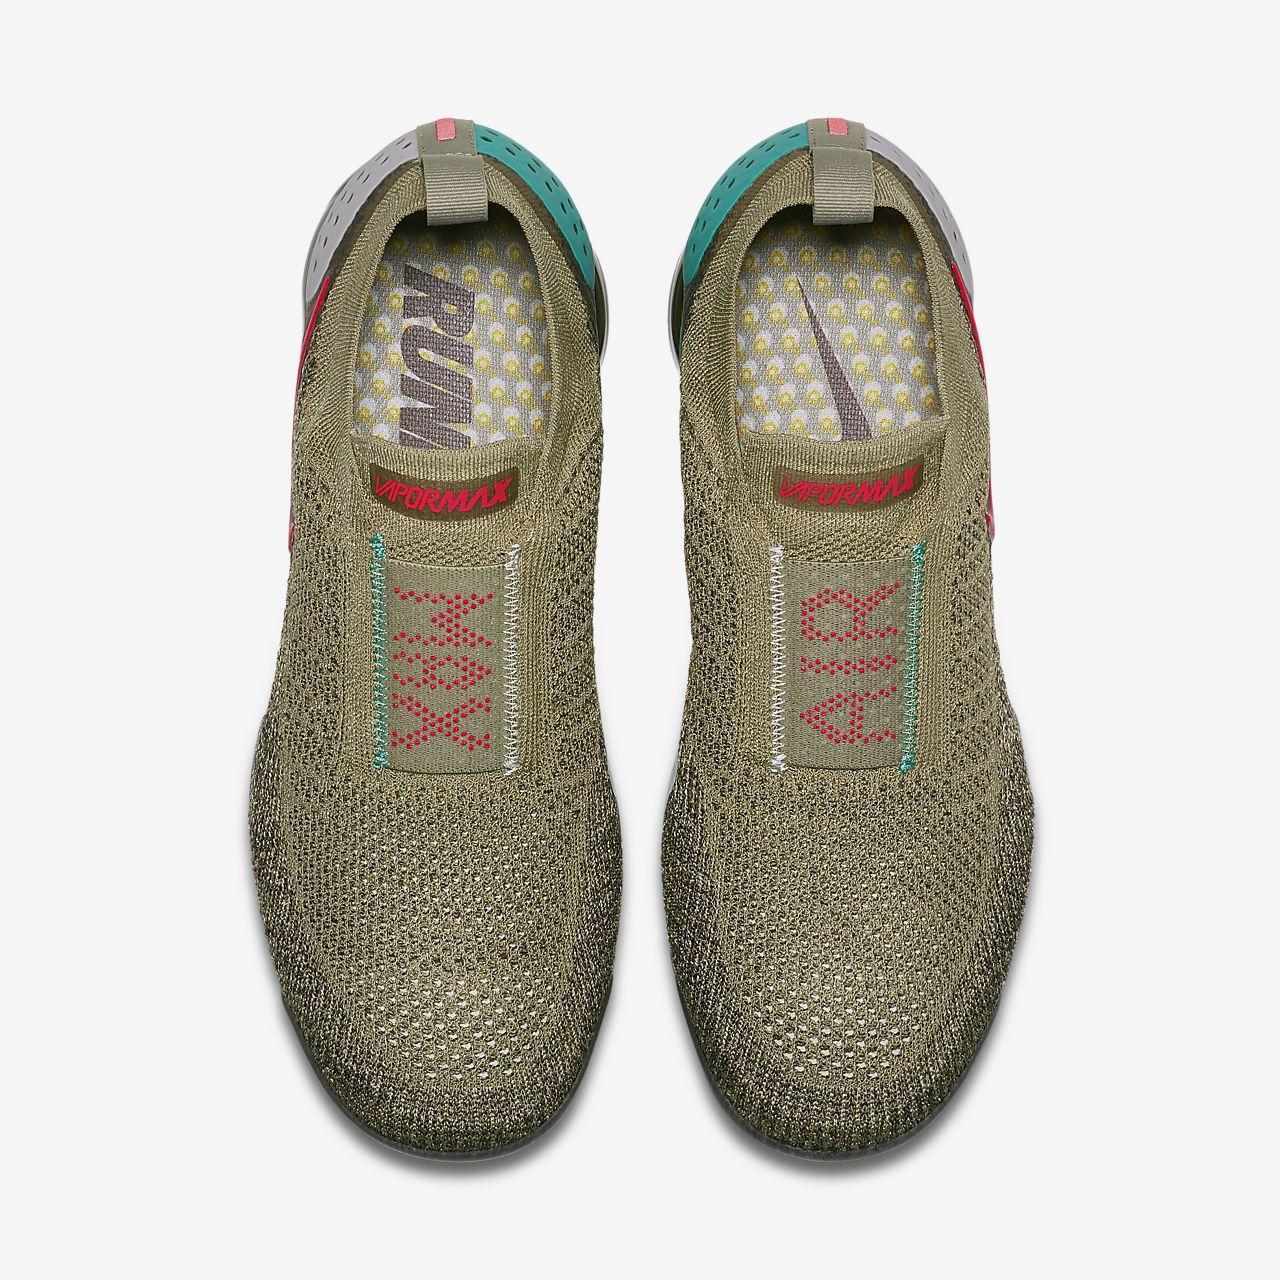 new styles 127b1 e2945 ... Chaussure Nike Air VaporMax Flyknit Moc 2